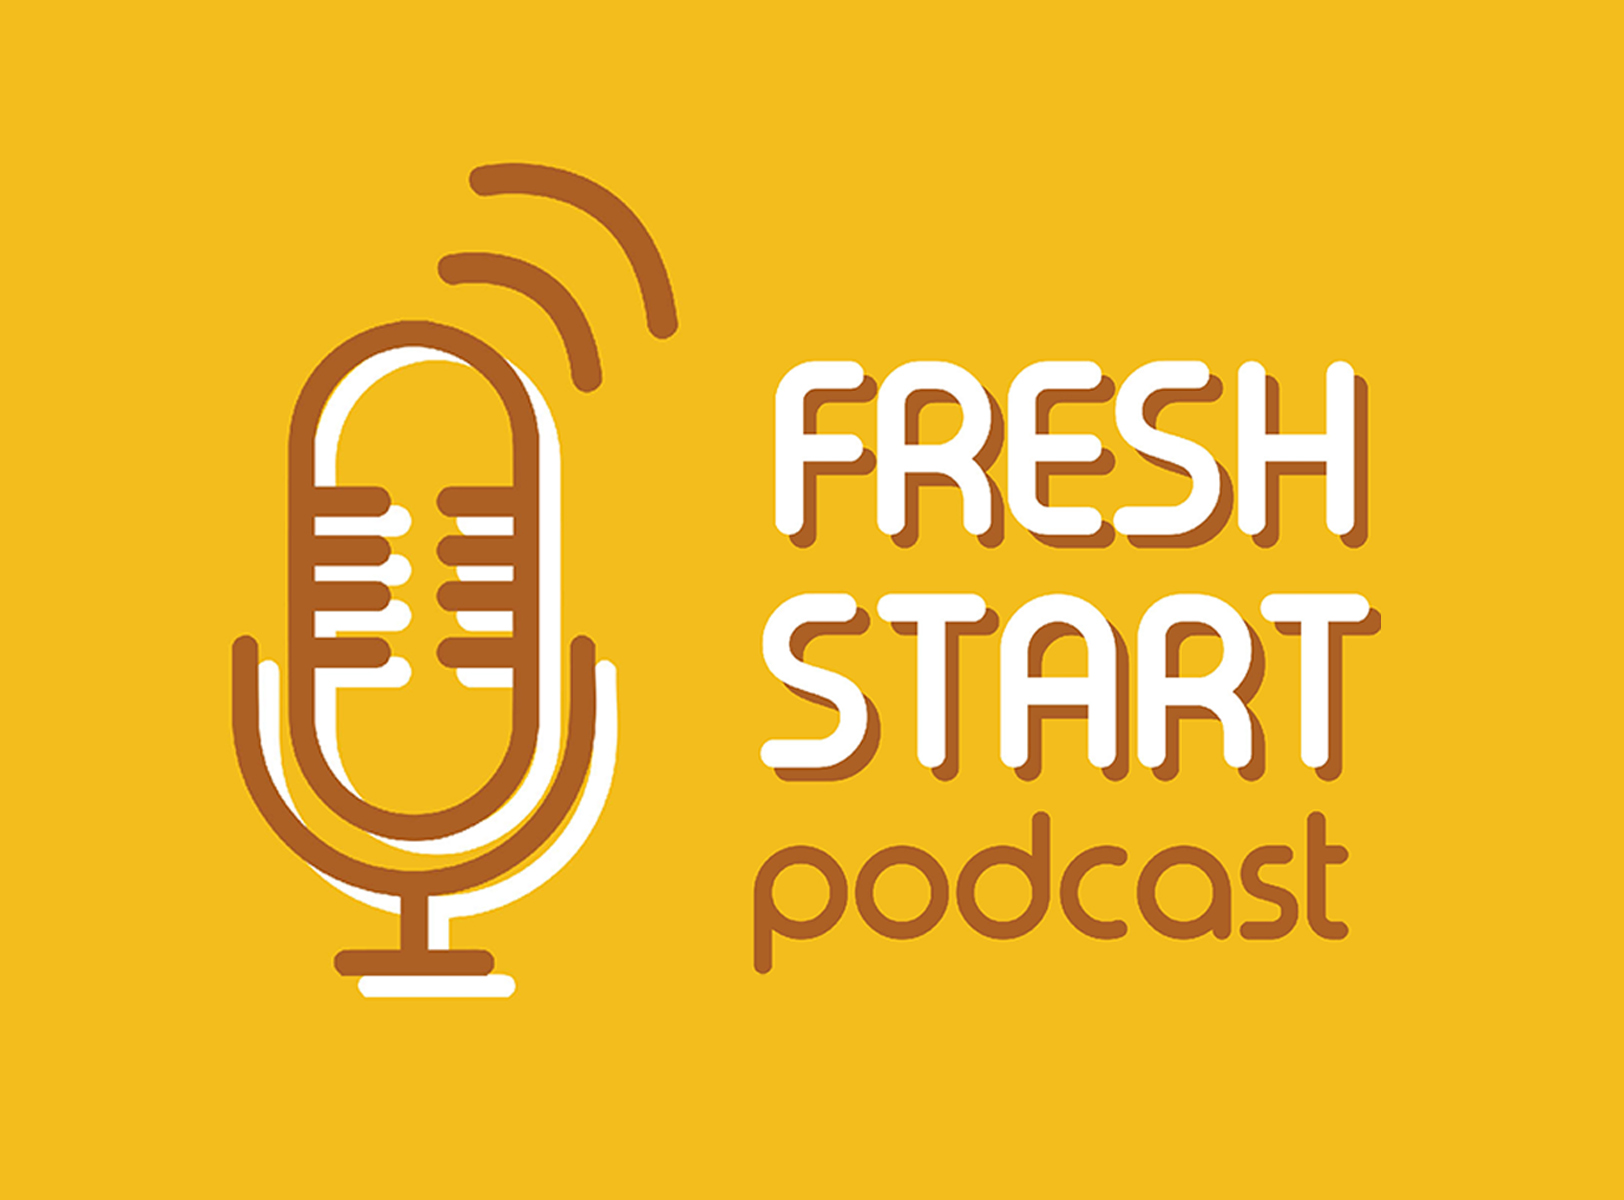 Fresh Start: Podcast News (10/30/2019 Wed.)